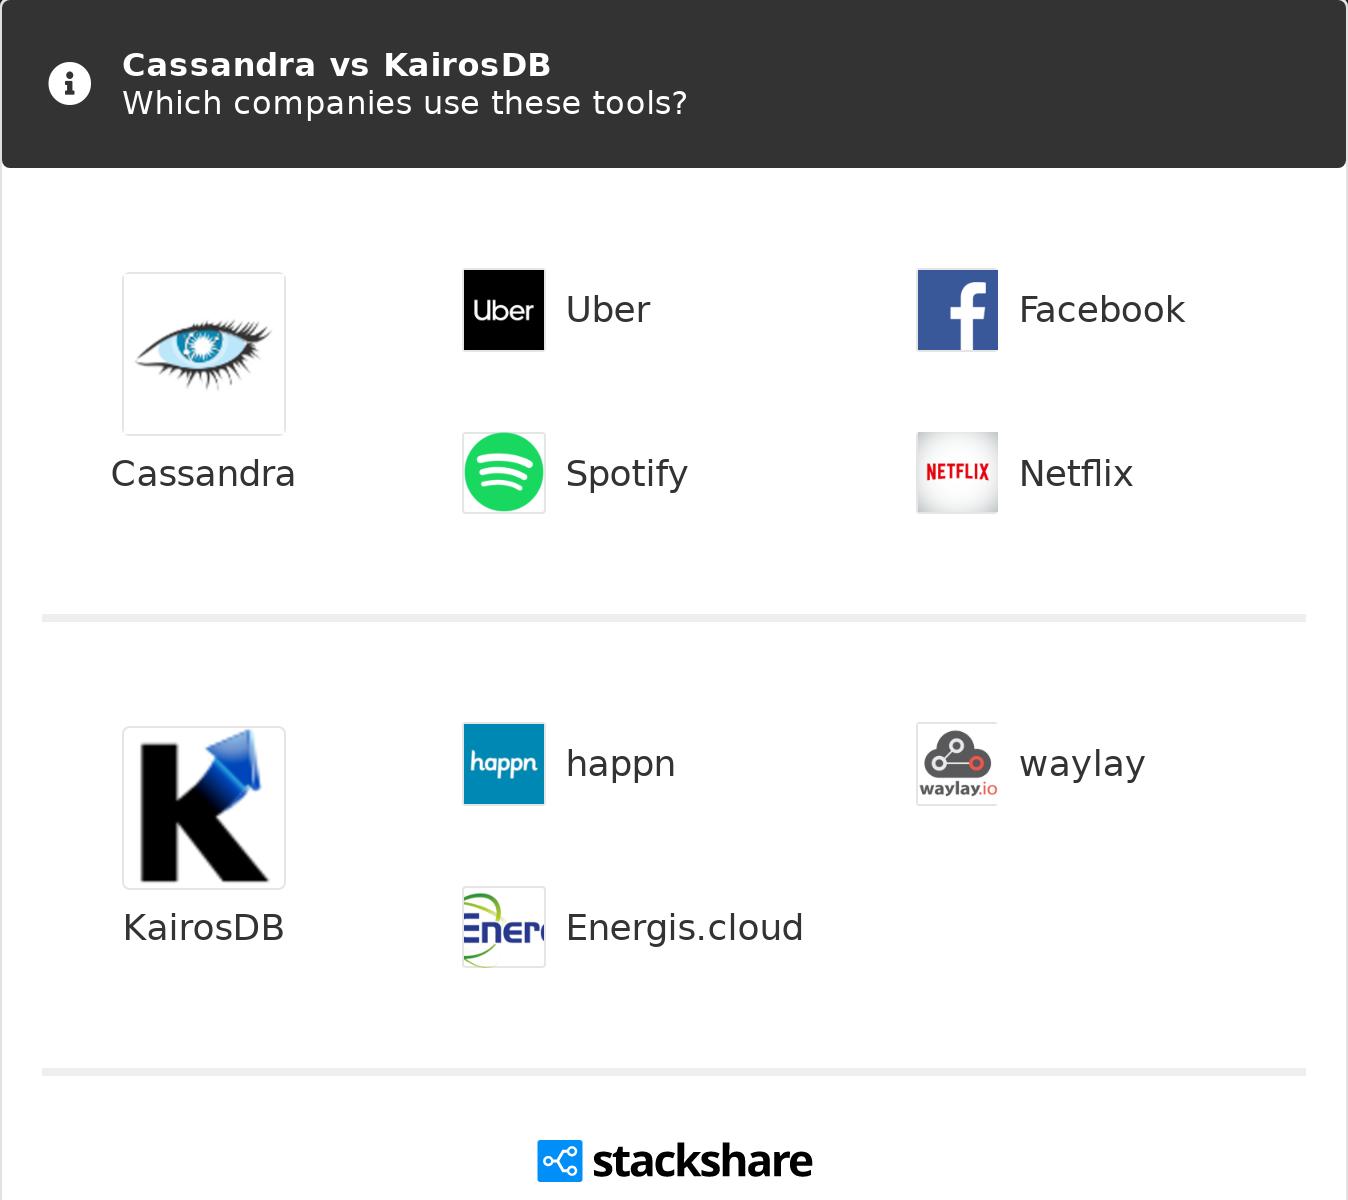 Cassandra vs KairosDB | What are the differences?